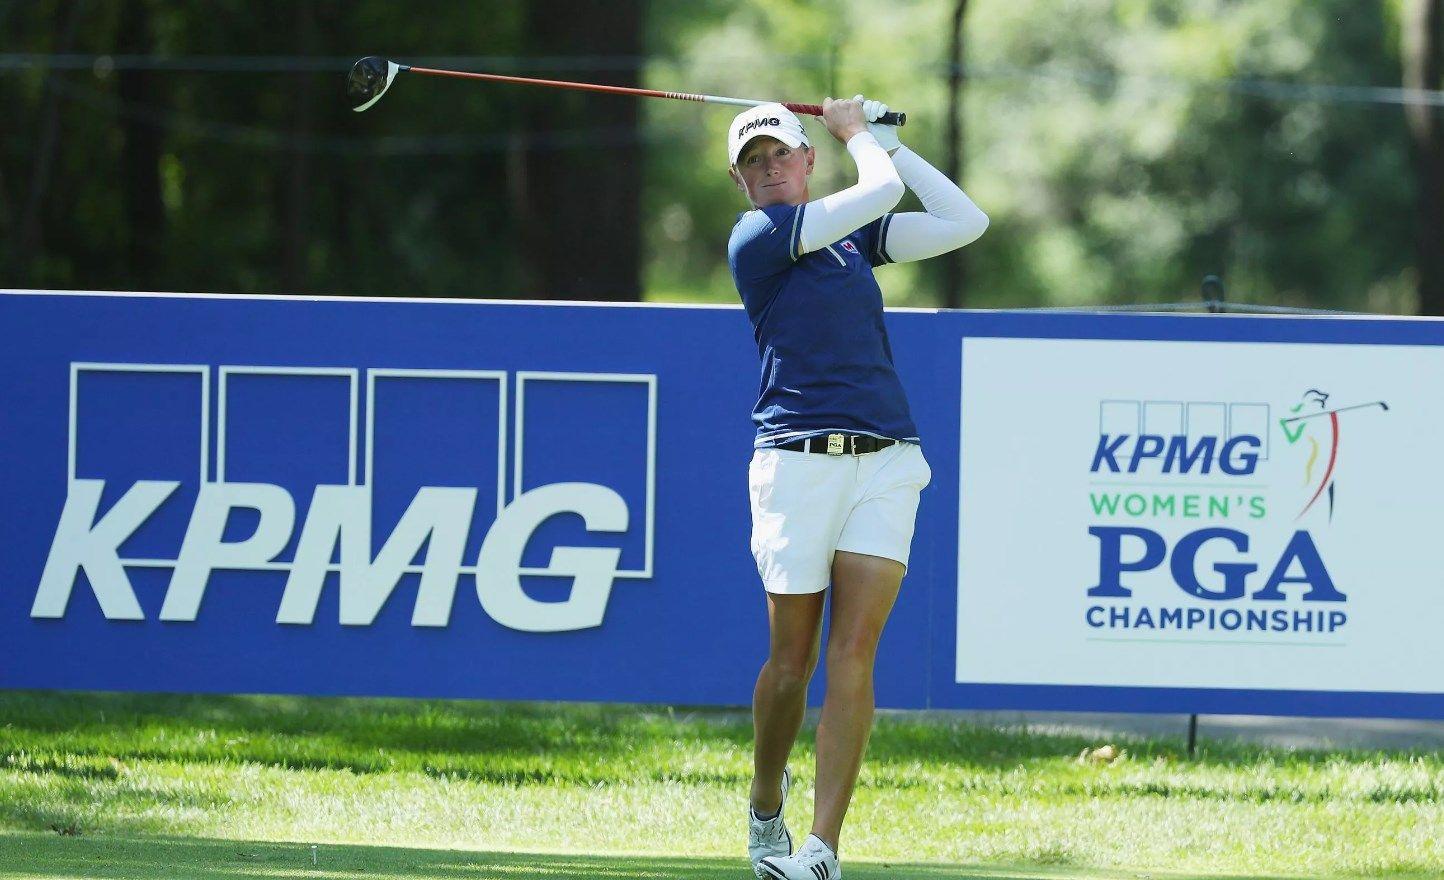 Watch KPMG Women's PGA Championship Live Streaming Online